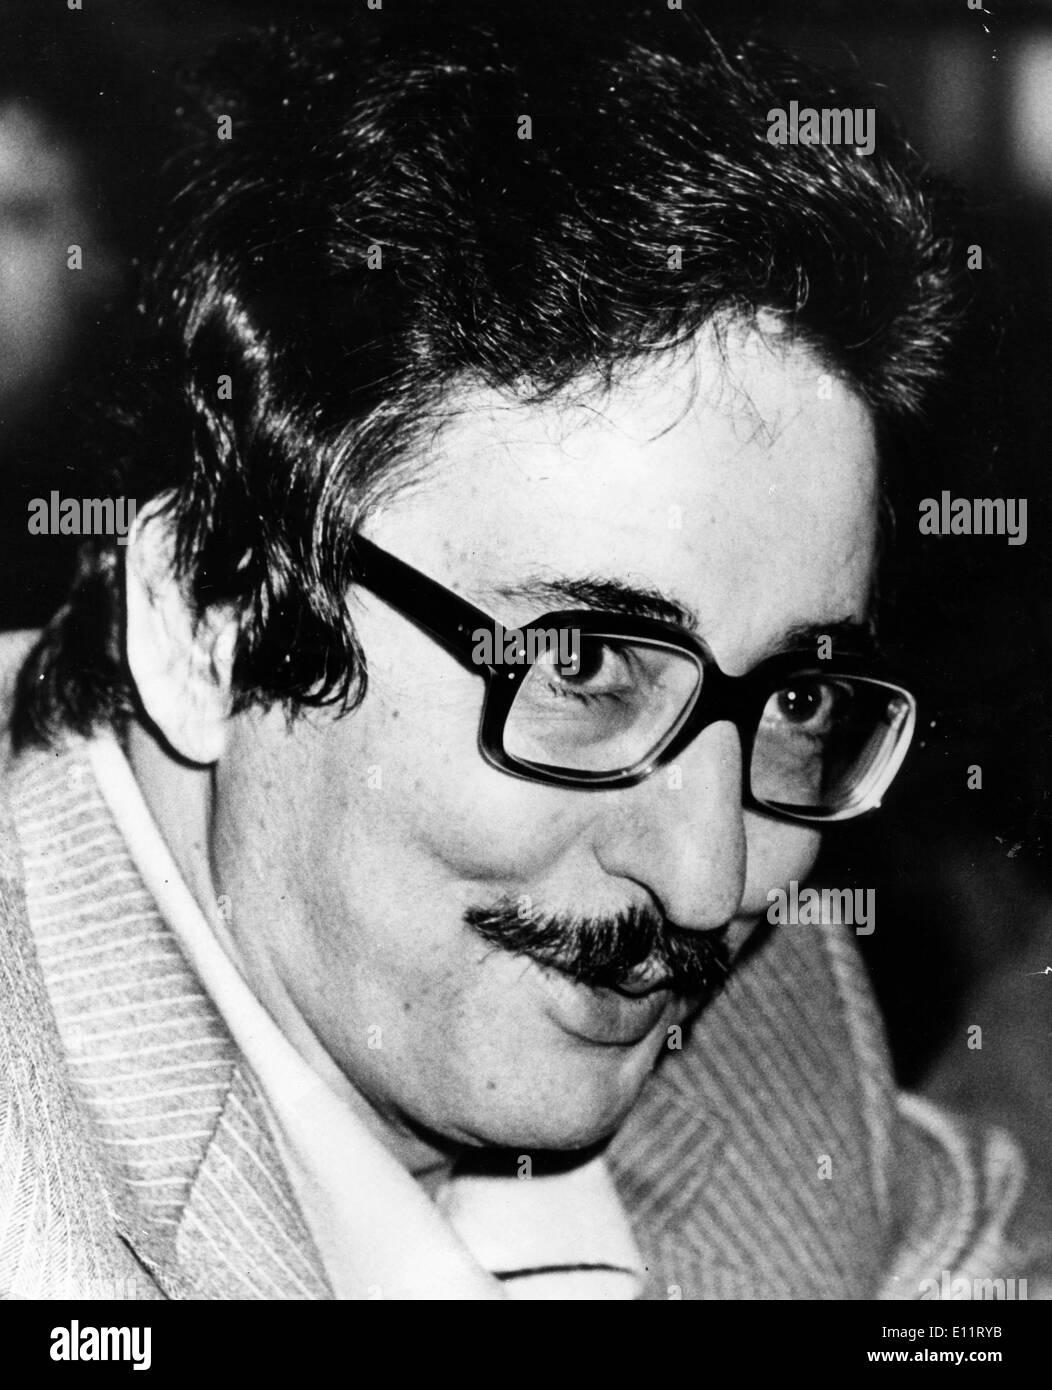 Nov 08, 1979 - Tehran, Iran - ABOL-HASSAN BANISADR was the first President of Iran, following the 1979 Iranian Revolution - Stock Image